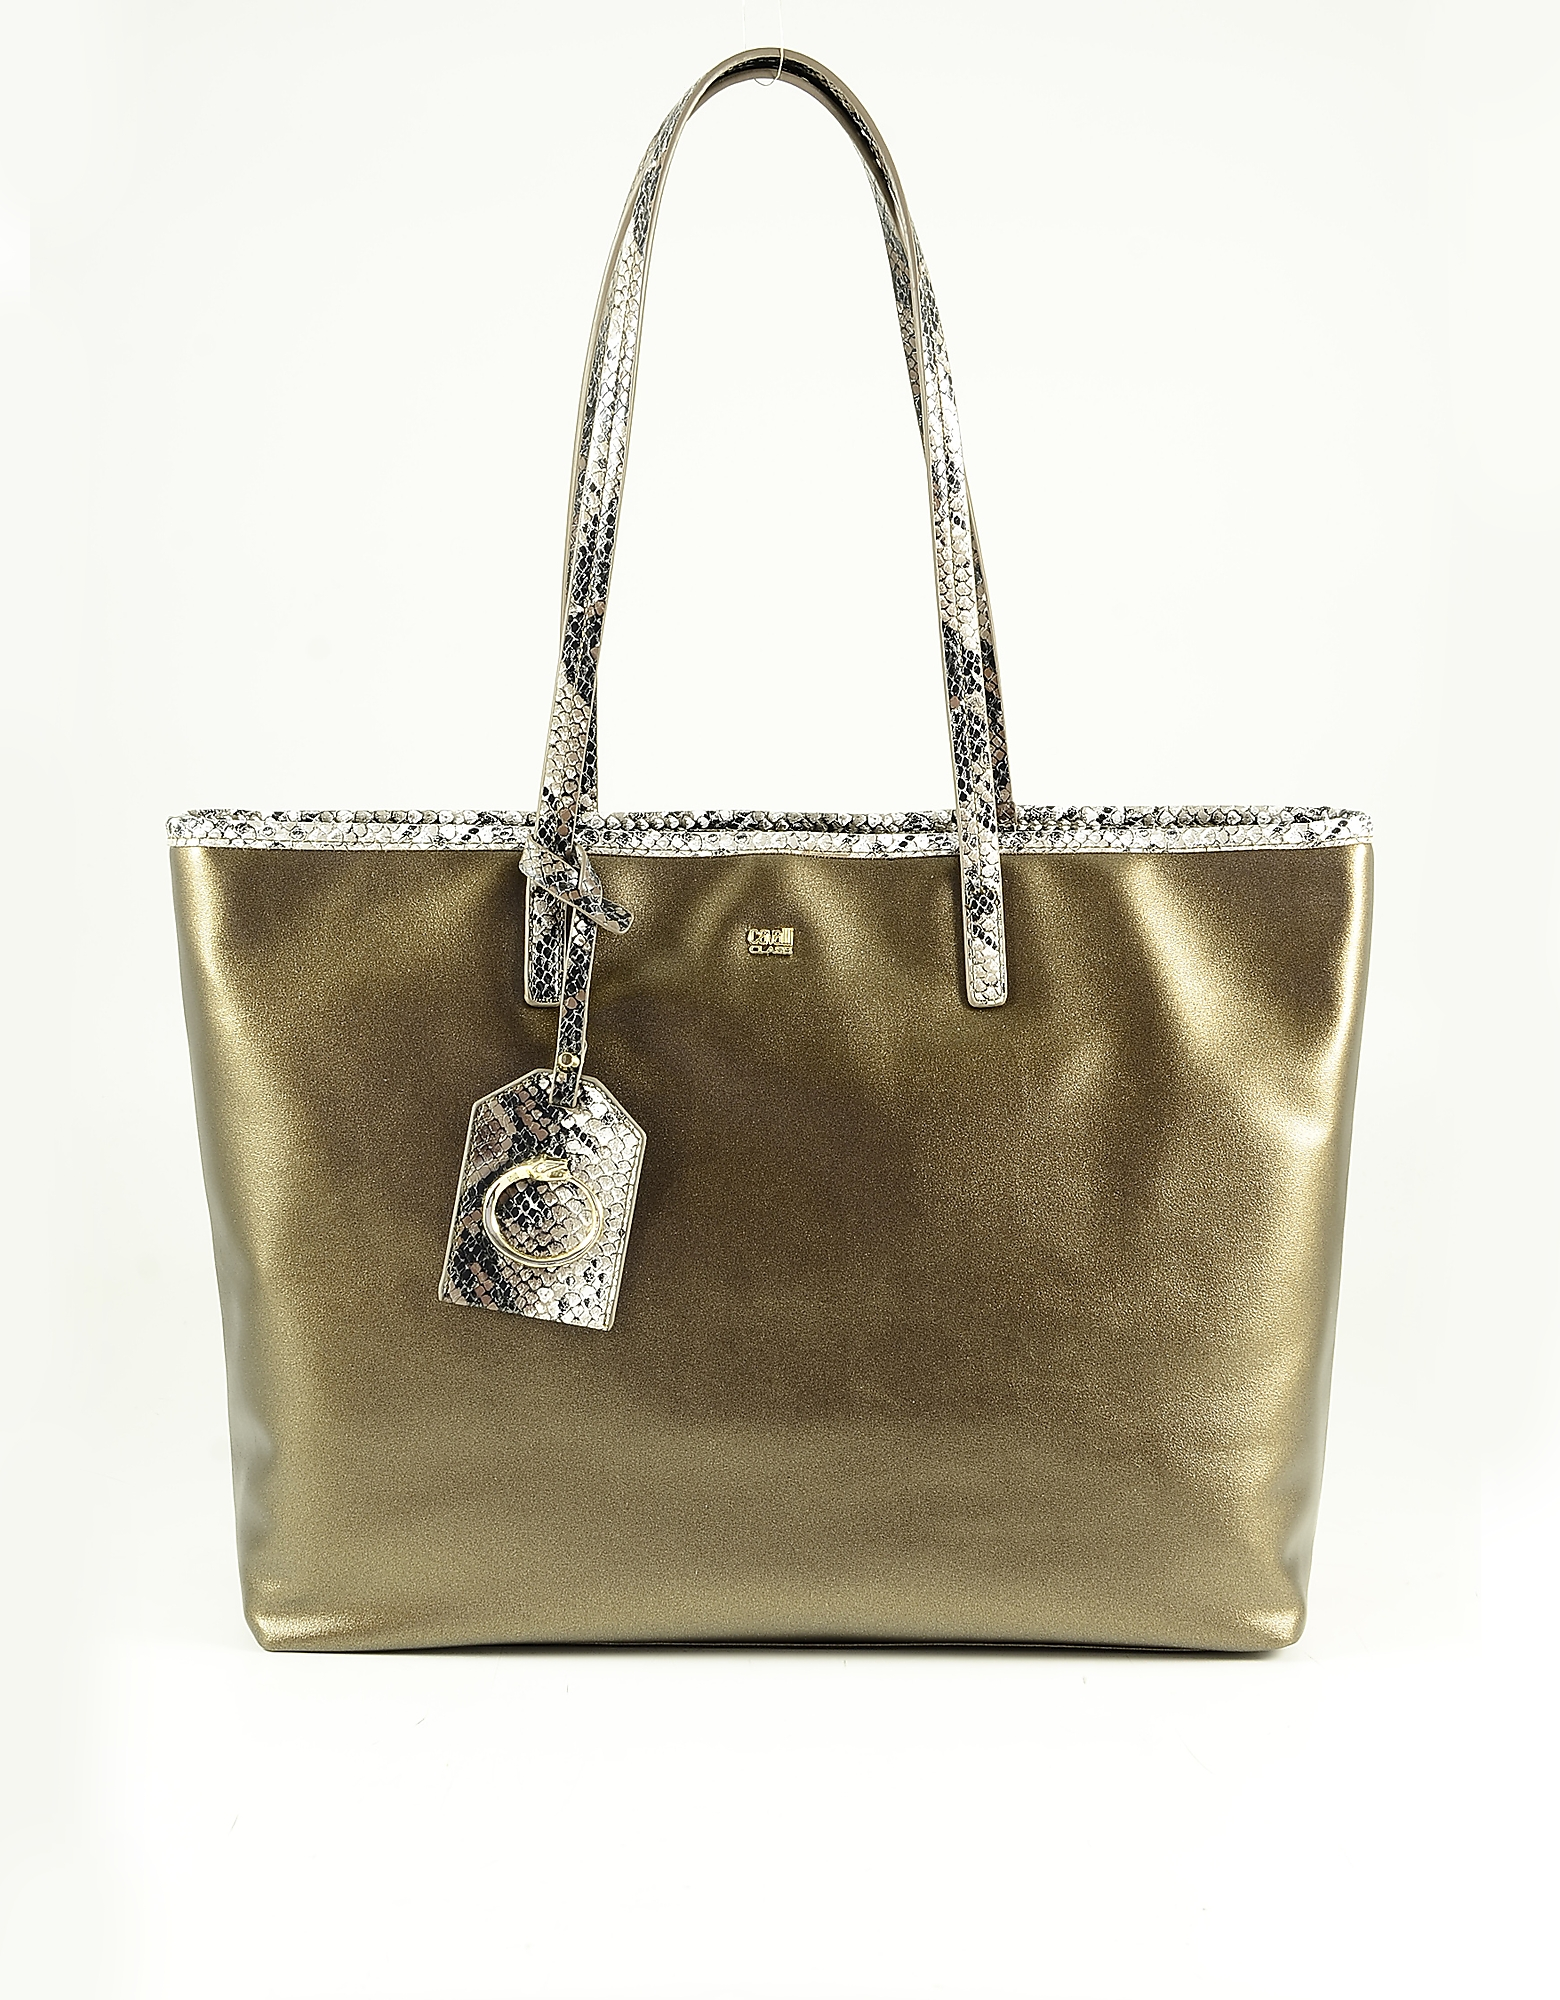 Class Roberto Cavalli Metallic Bronze Eco-leather Tote Bag